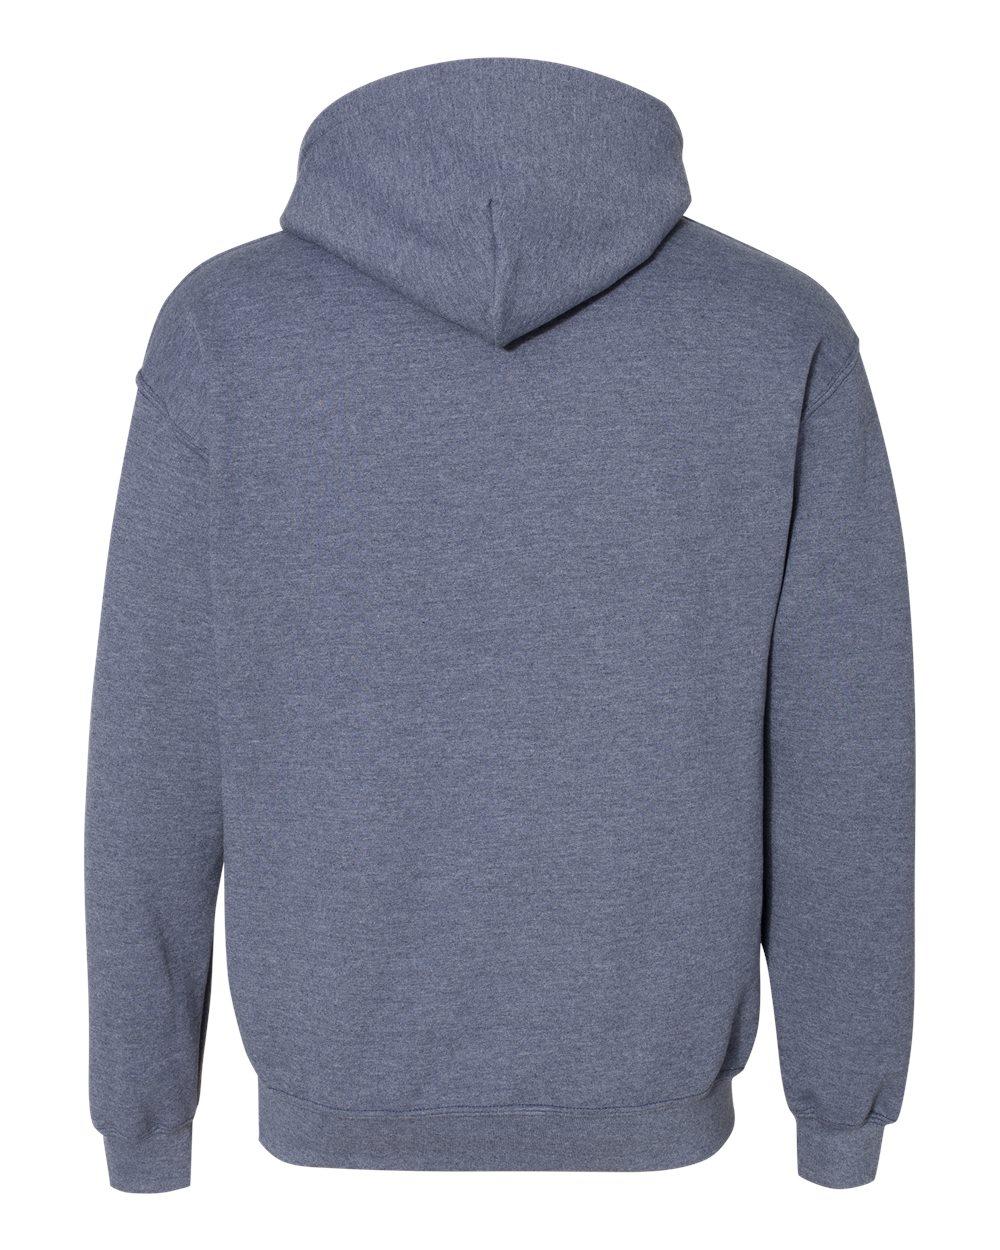 Gildan-Mens-Blank-Hoodie-Heavy-Blend-Hooded-Sweatshirt-18500-up-to-5XL thumbnail 28